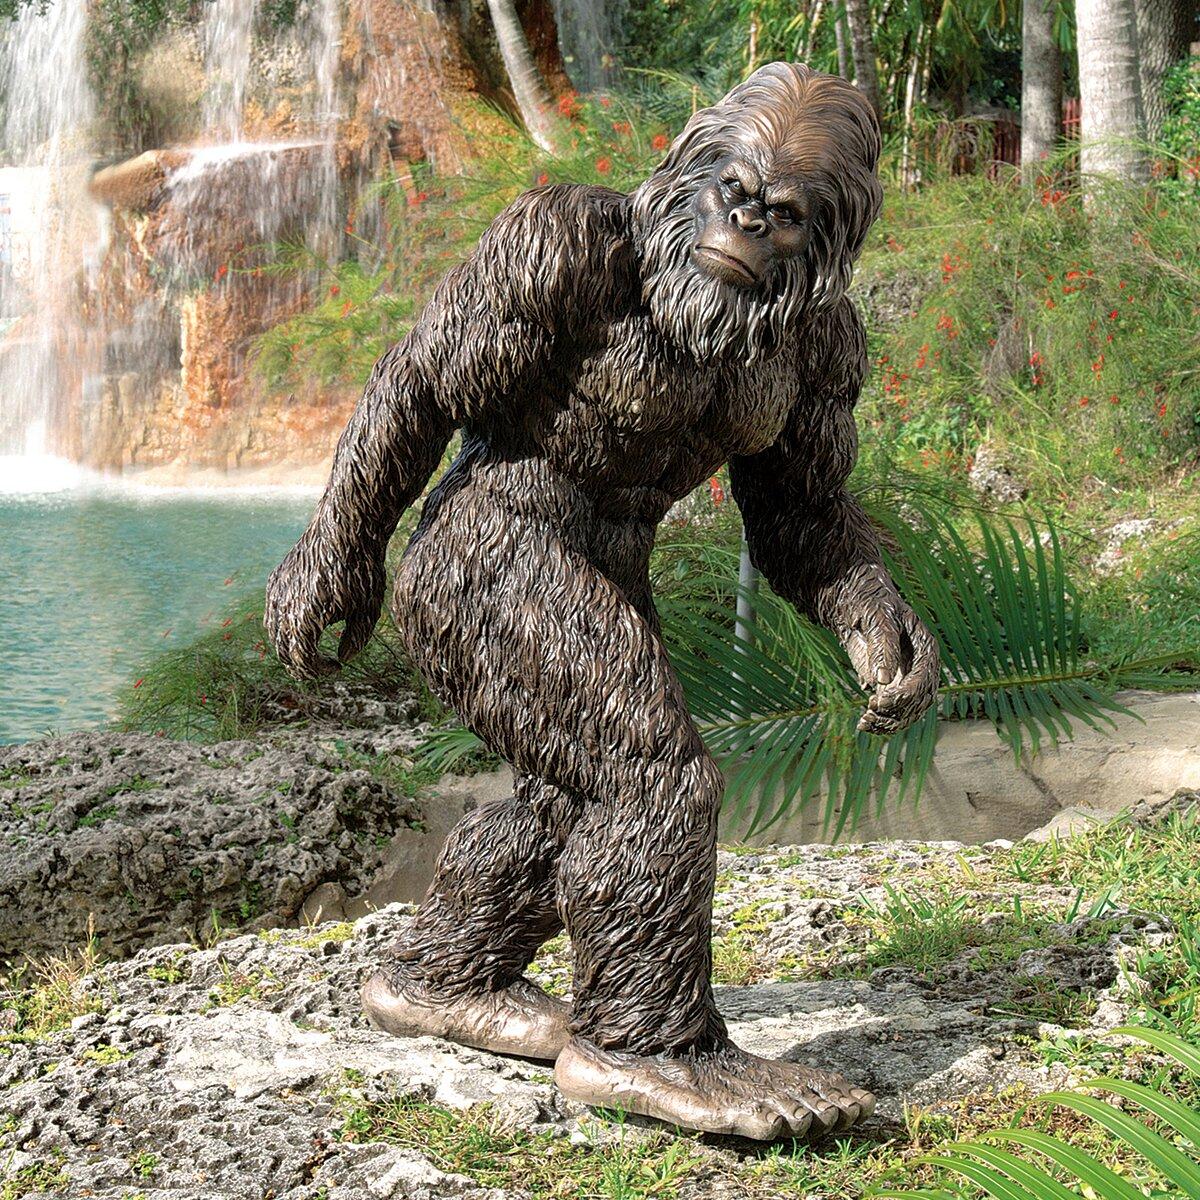 Bigfoot lawn ornament - Bigfoot Lawn Ornament 0